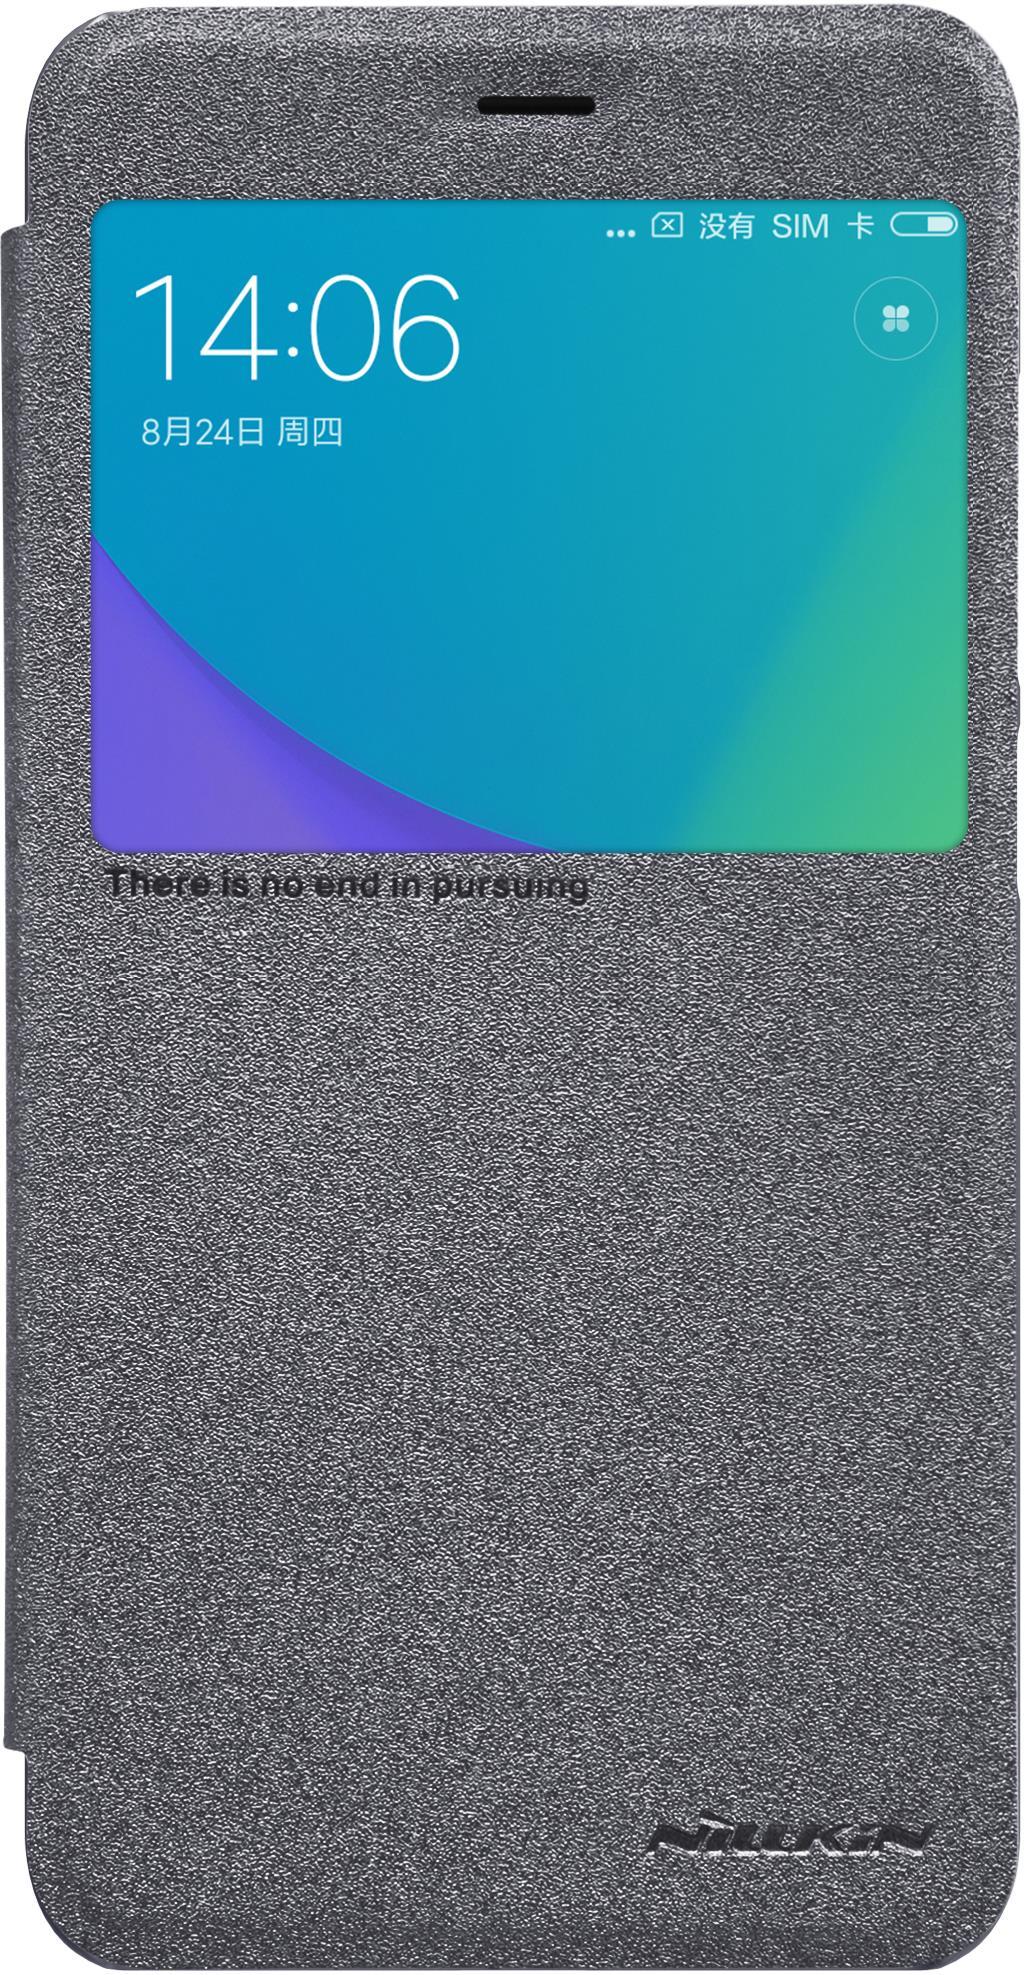 Чехол-книжка Nillkin Sparkle для Xiaomi Redmi Note 5A Prime, 6902048148666, черный чехол книжка nillkin sparkle для xiaomi redmi note 5a prime gold